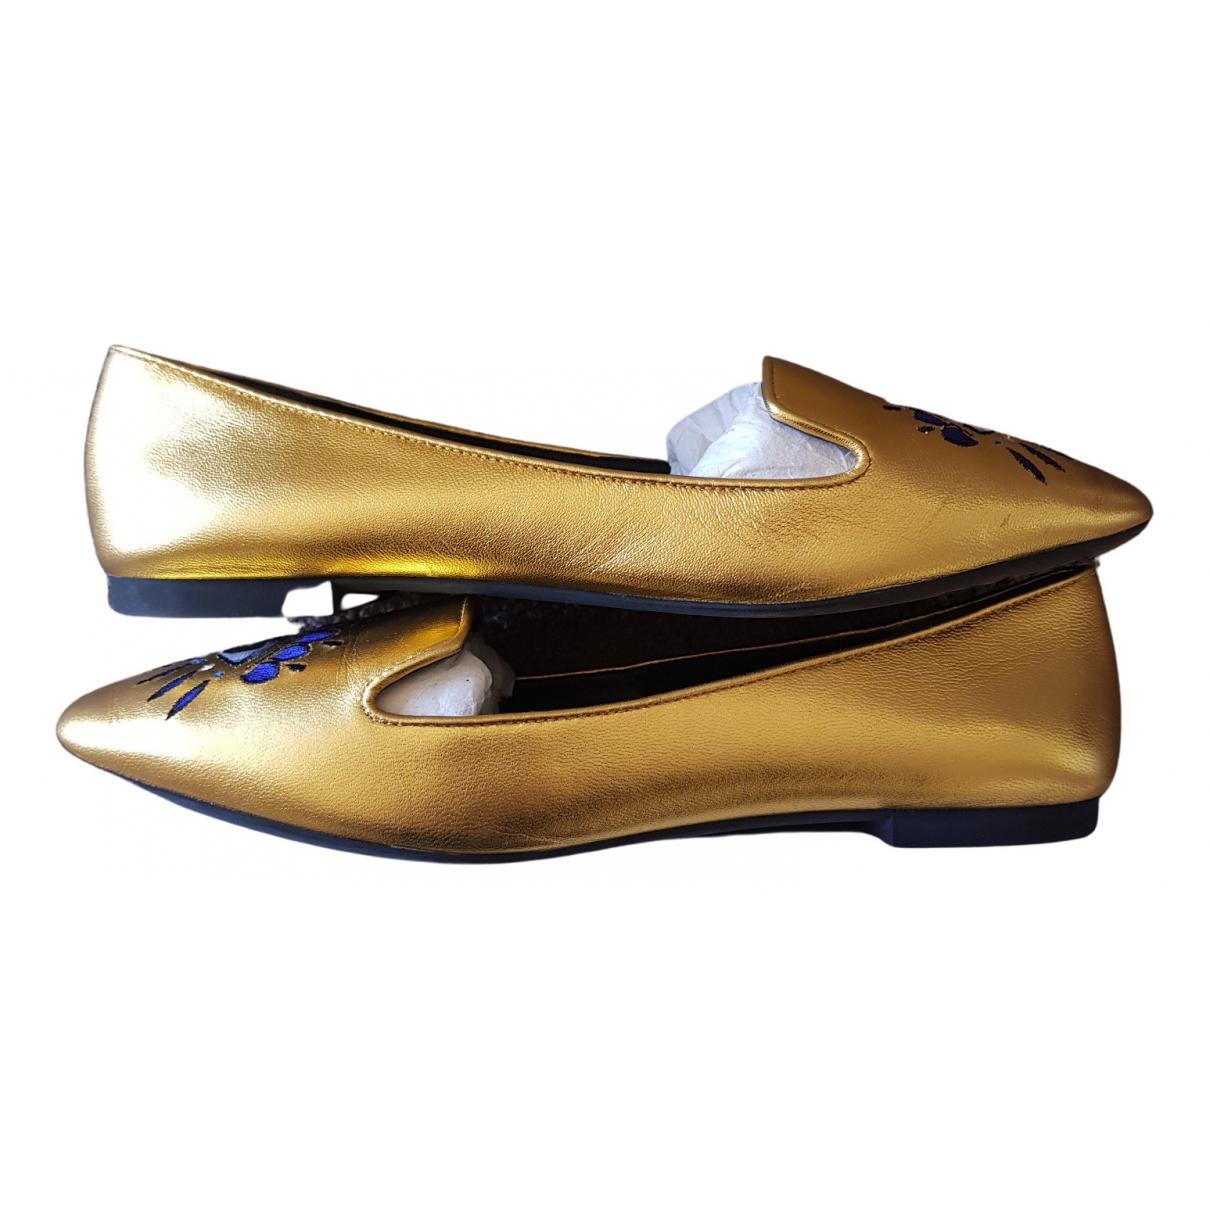 Kenzo N Gold Leather Flats for Women 38 EU